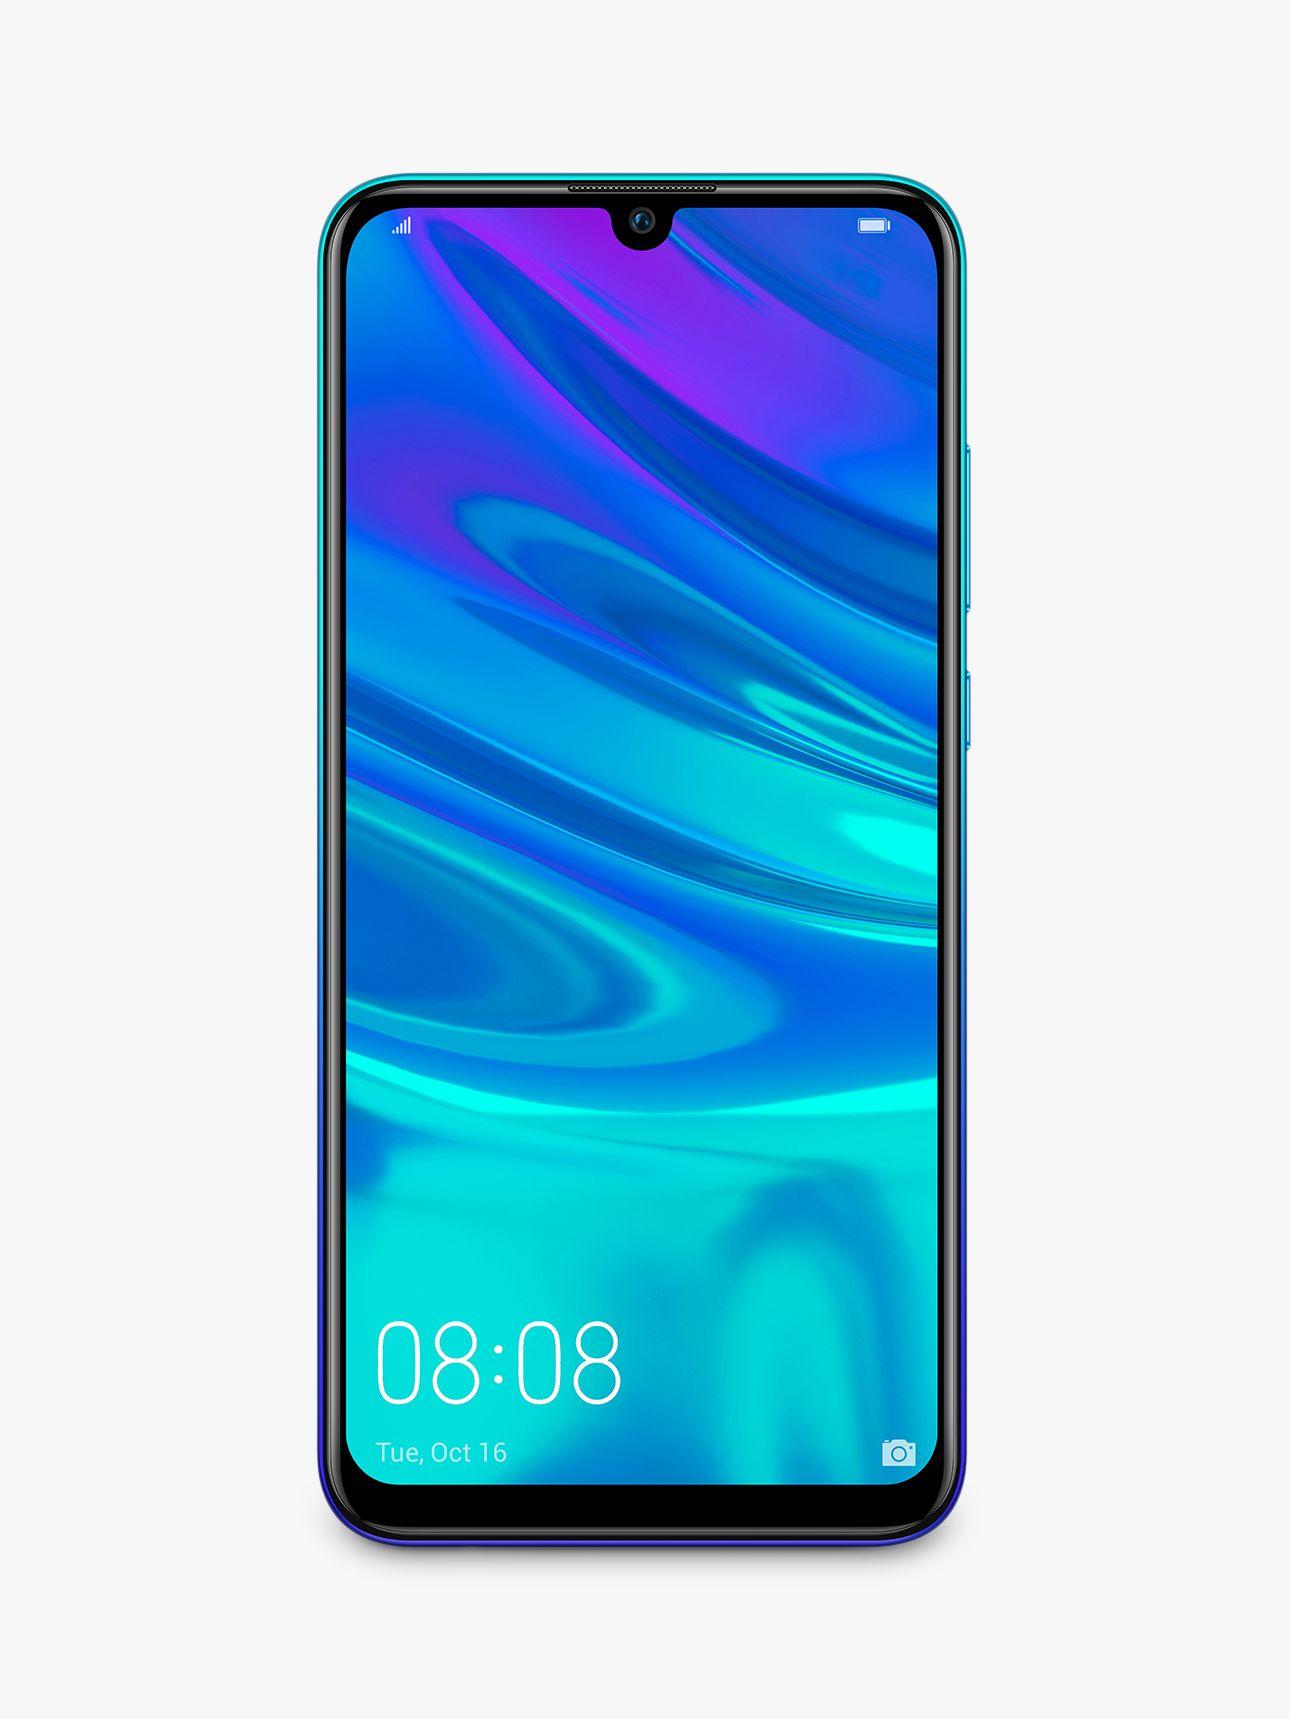 "Huawei Huawei P smart 2019 Smartphone, Android, 6.21"", 4G LTE, SIM Free, 64GB"